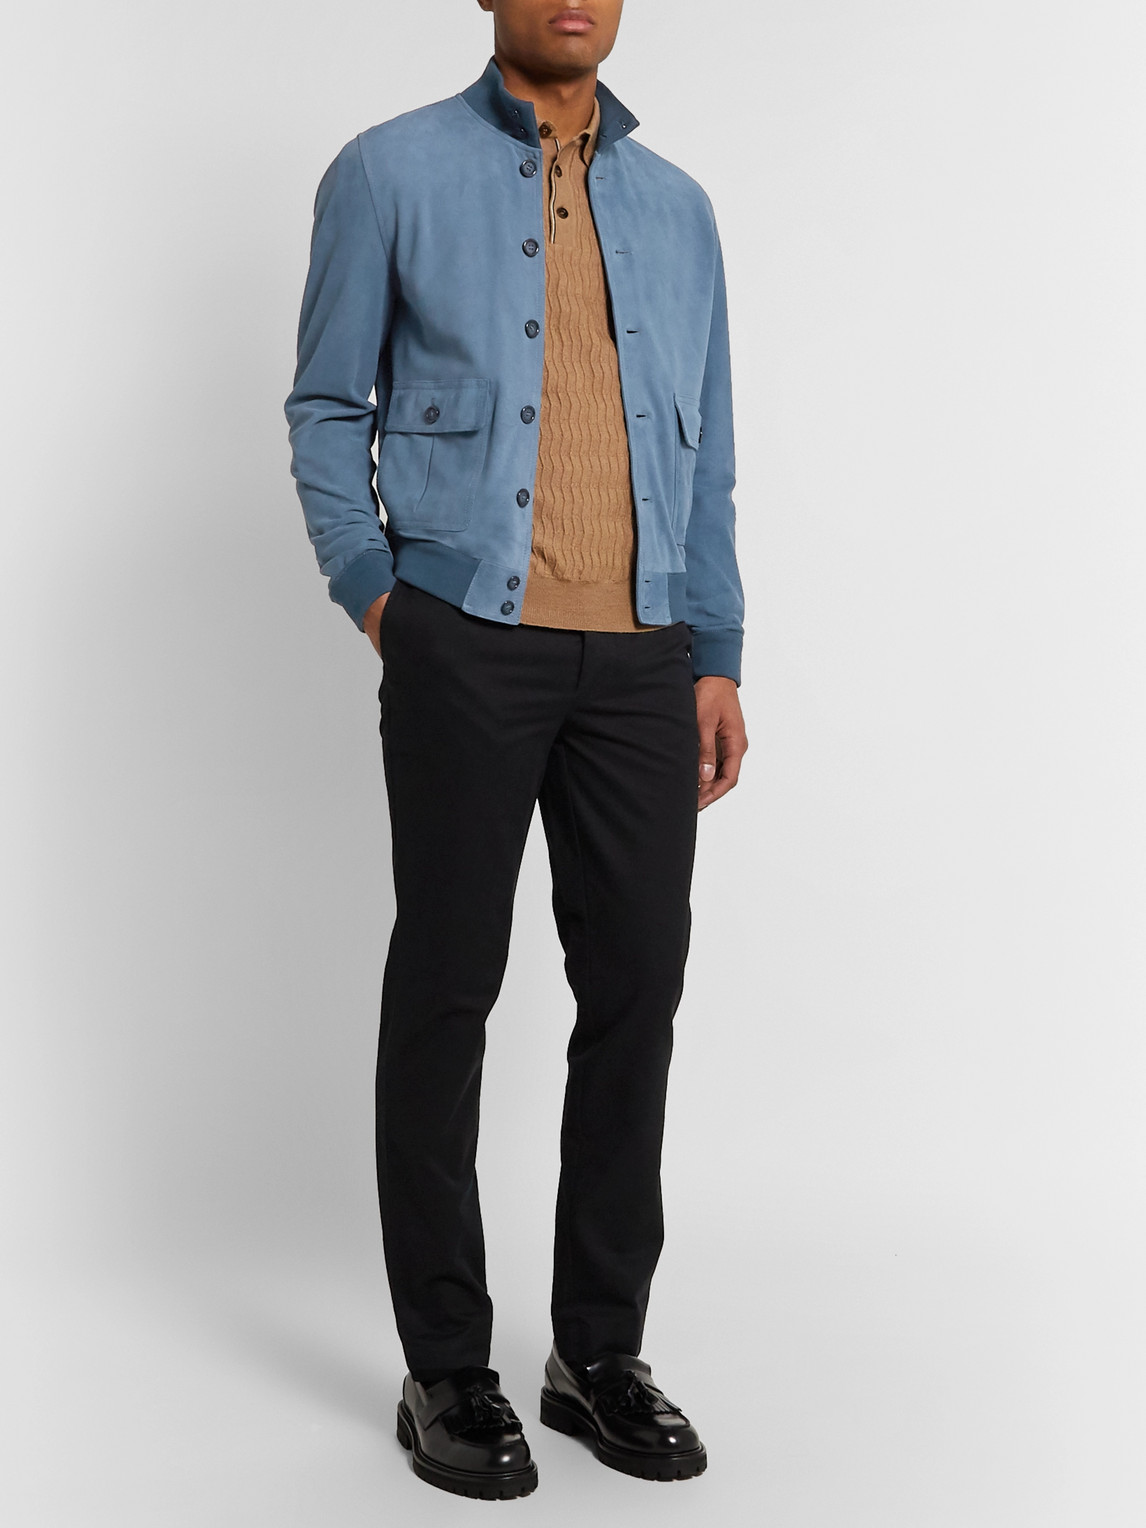 Valstar Ino Slim-fit Suede Bomber Jacket In Blue